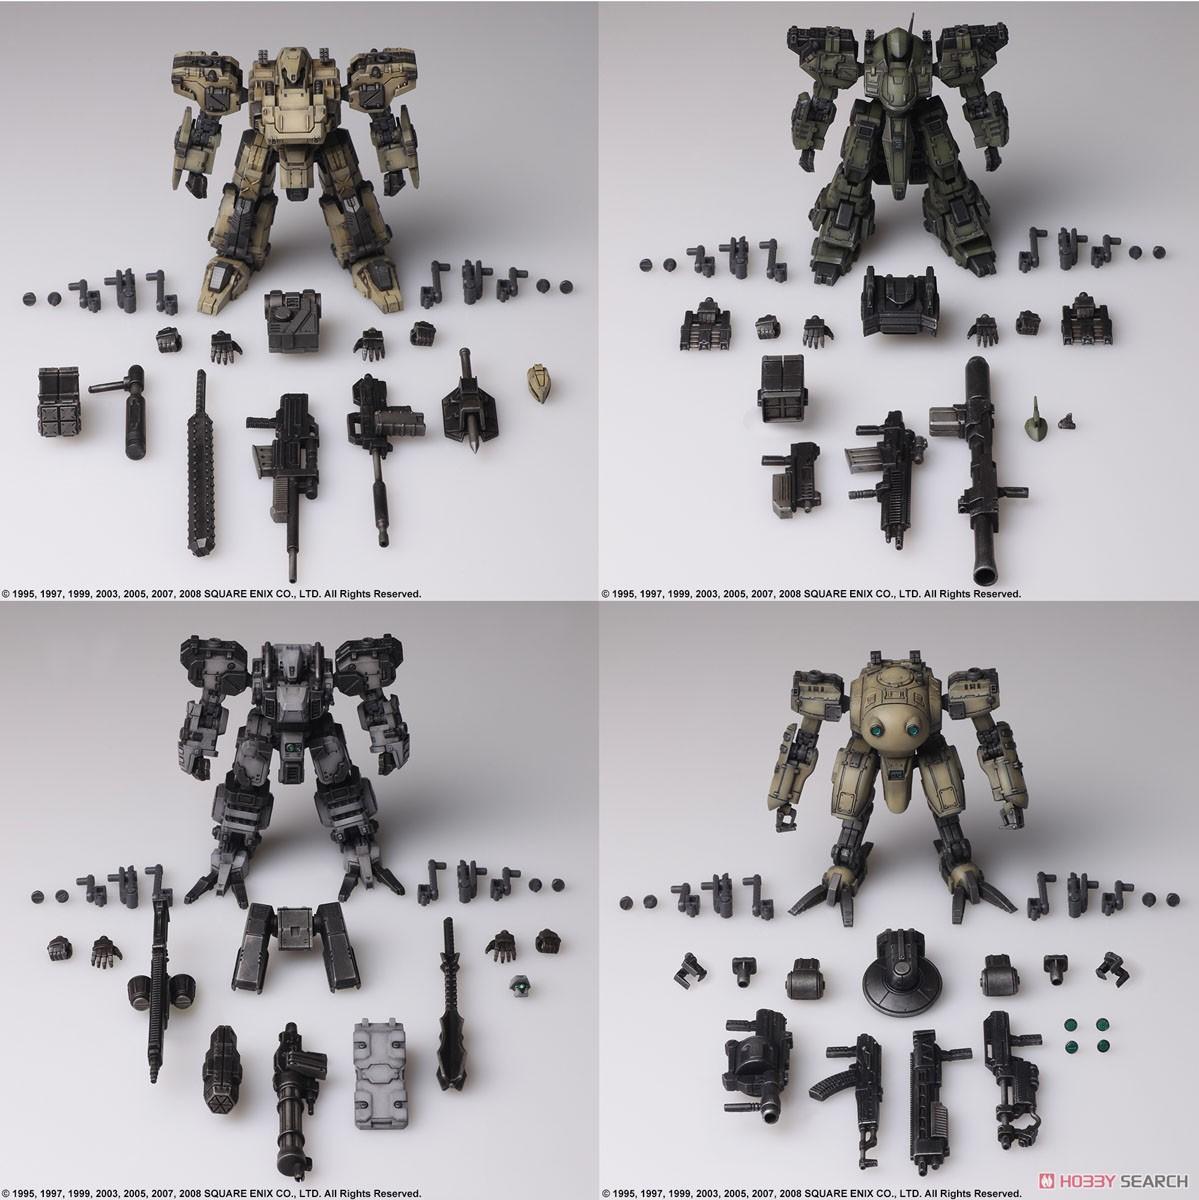 FRONT MISSION『フロントミッション ストラクチャーアーツ Vol.2』FRONT MISSION STRUCTURE ARTS 1/72 プラモデル 全4種BOX-037